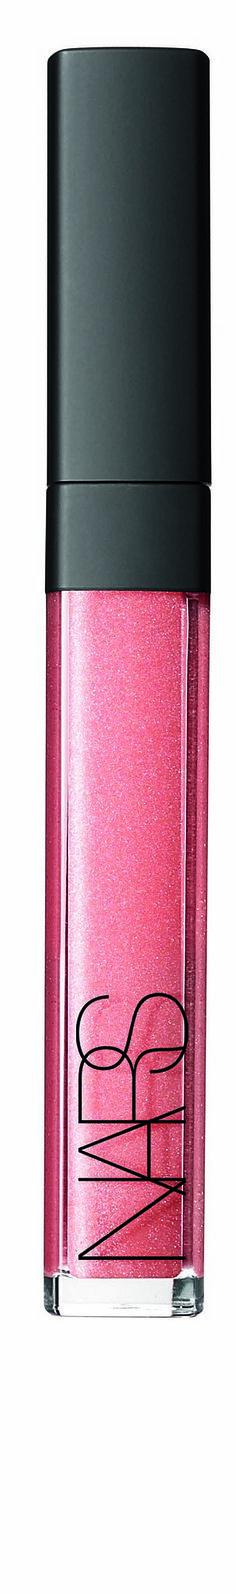 Bimini Larger Than Life Lip Gloss ($26) @NARS Cosmetics